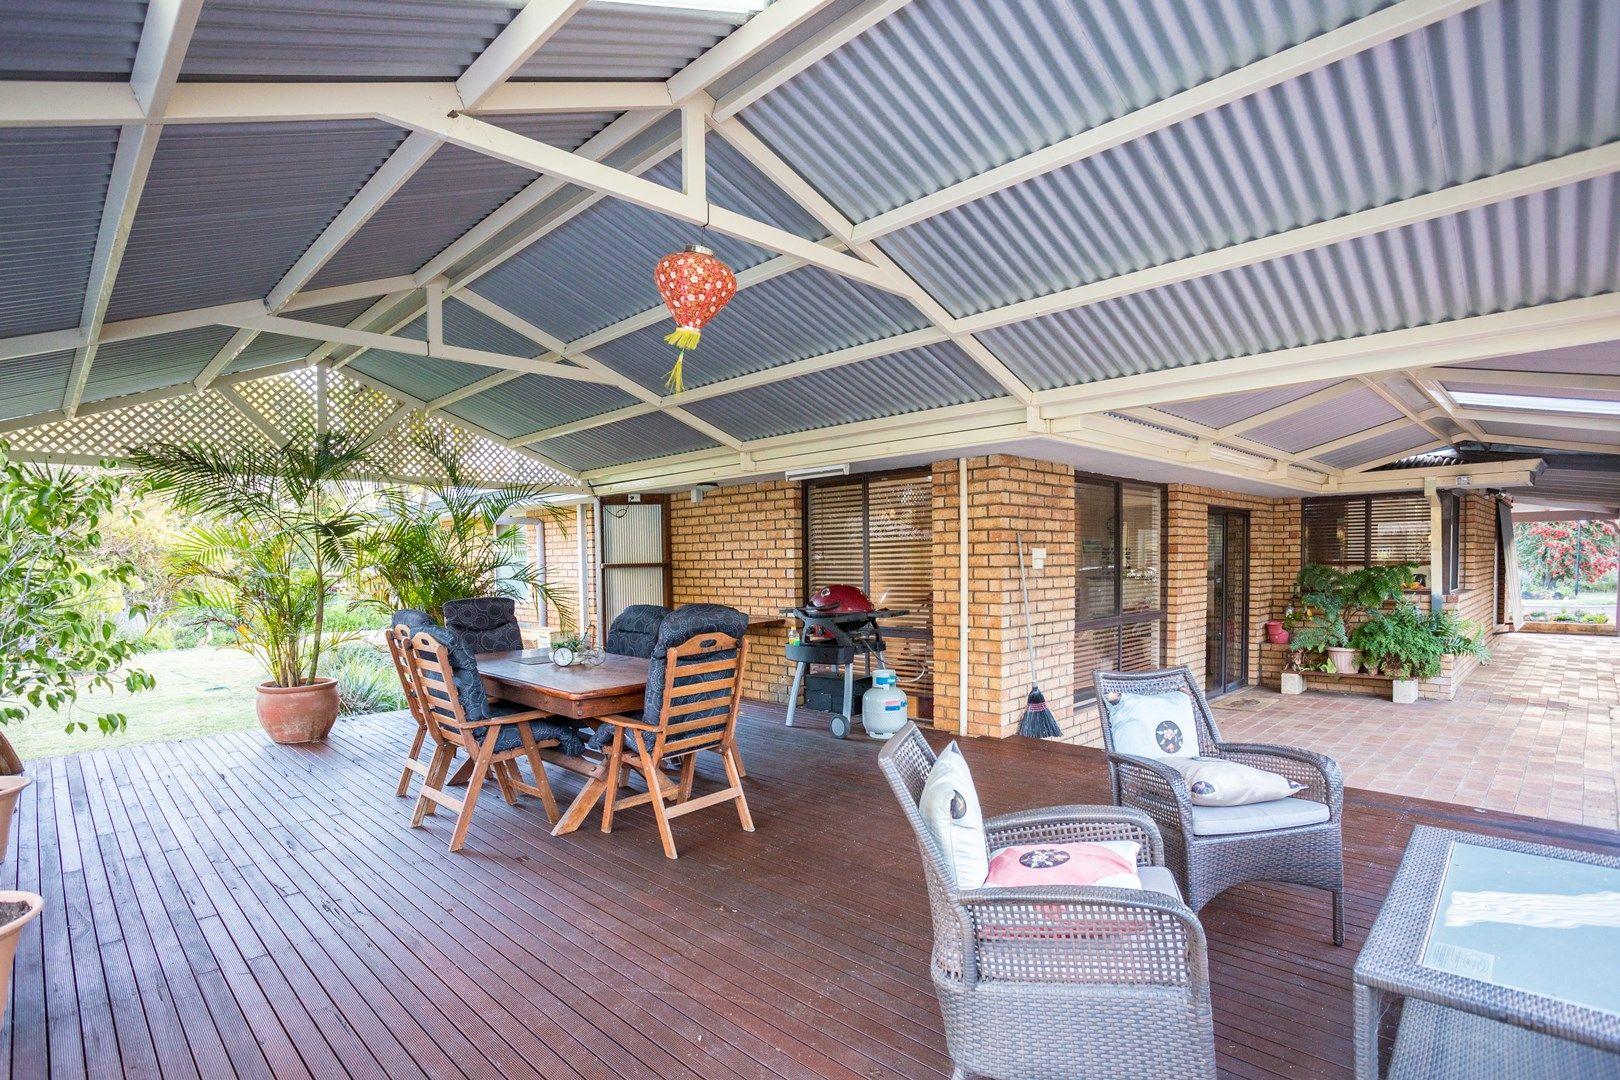 53 Australind Road, Leschenault WA 6233, Image 0